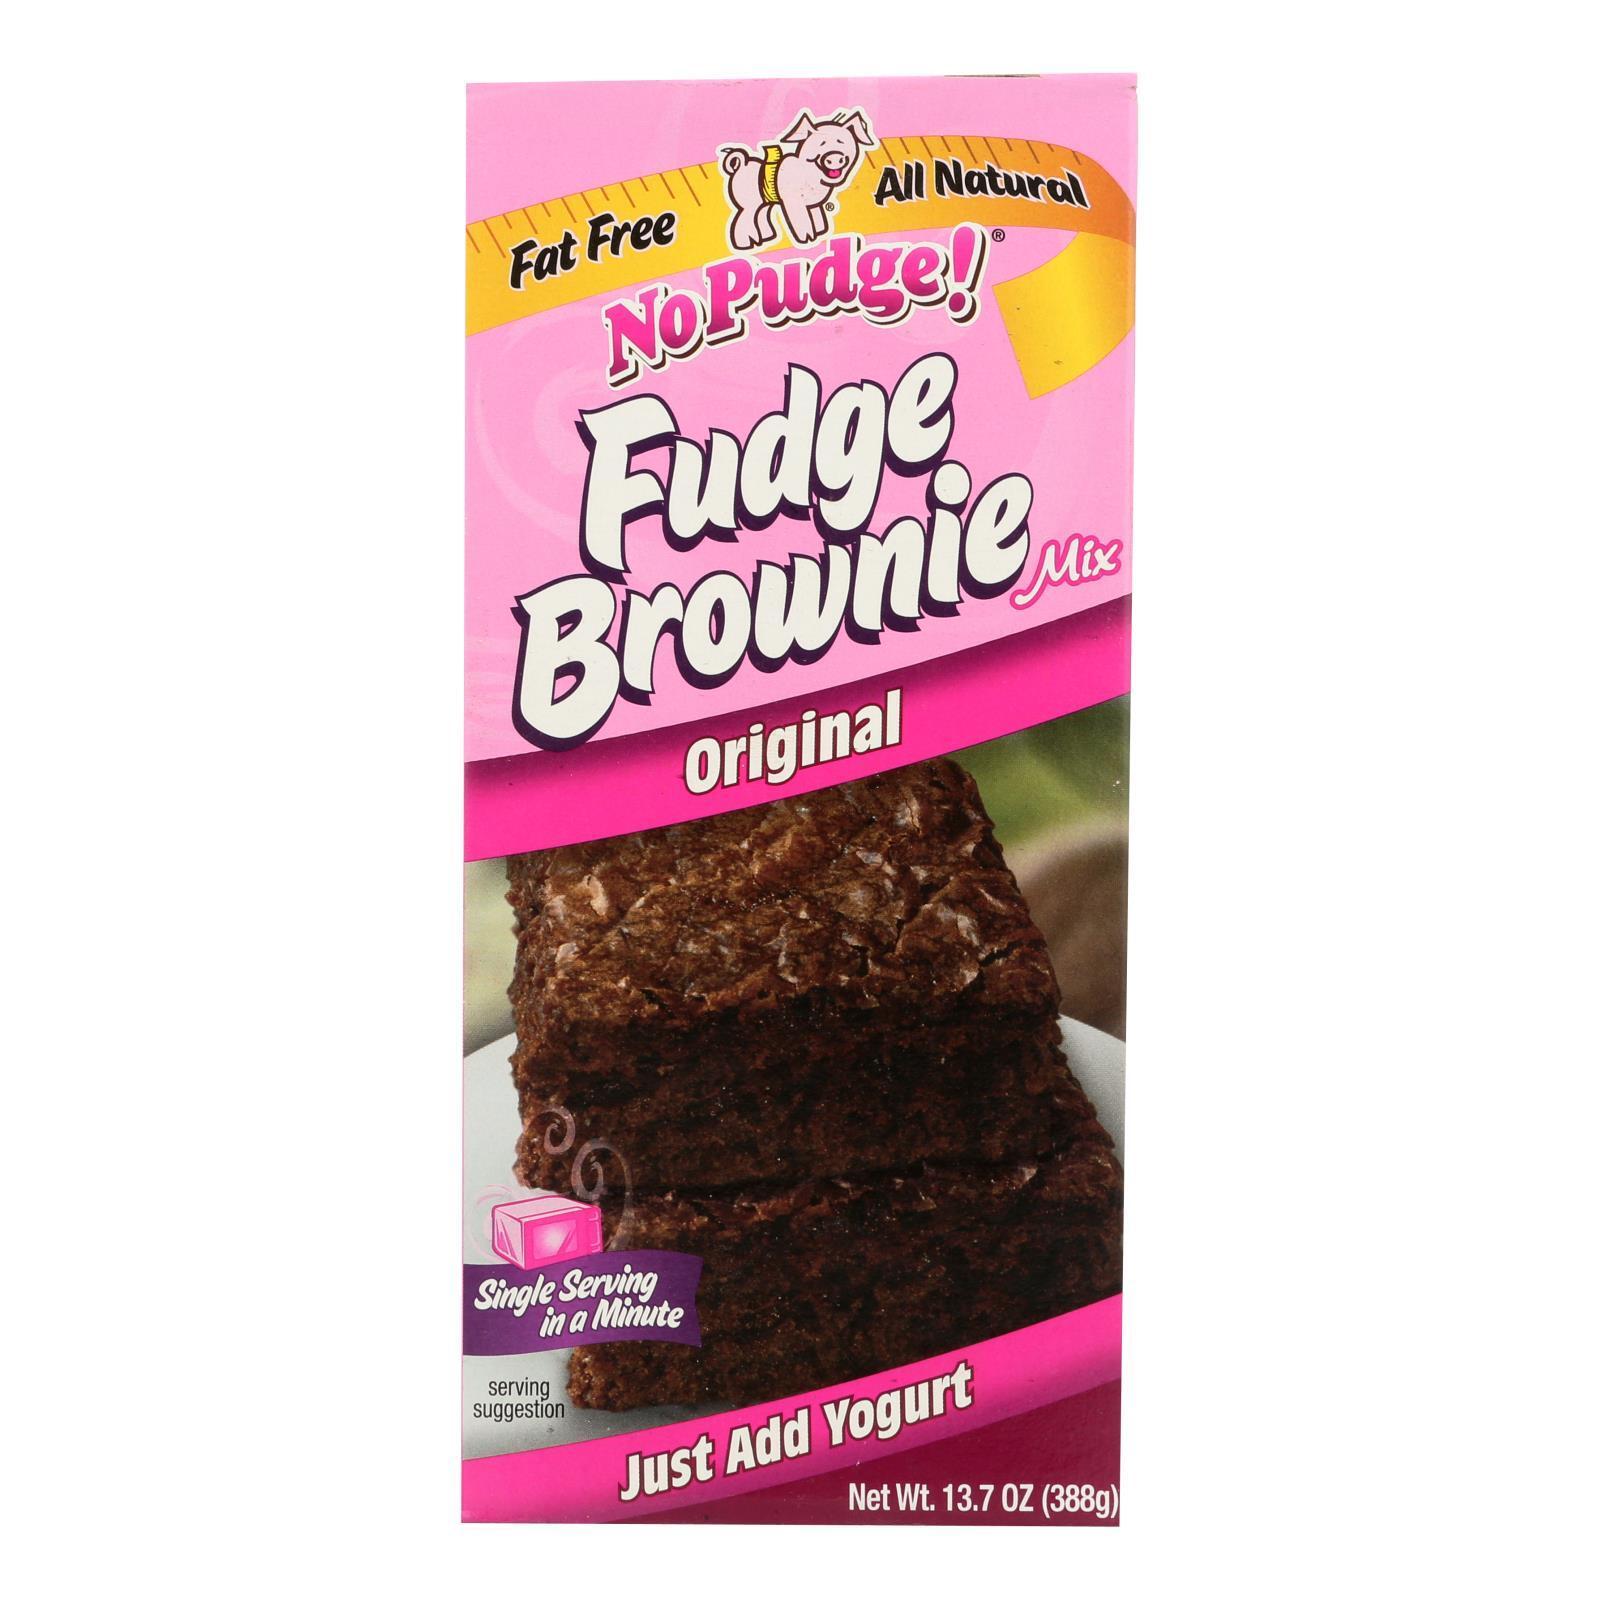 No Pudge Fudge Brownie Mix - Original - Case of 6 - 13.7 oz.